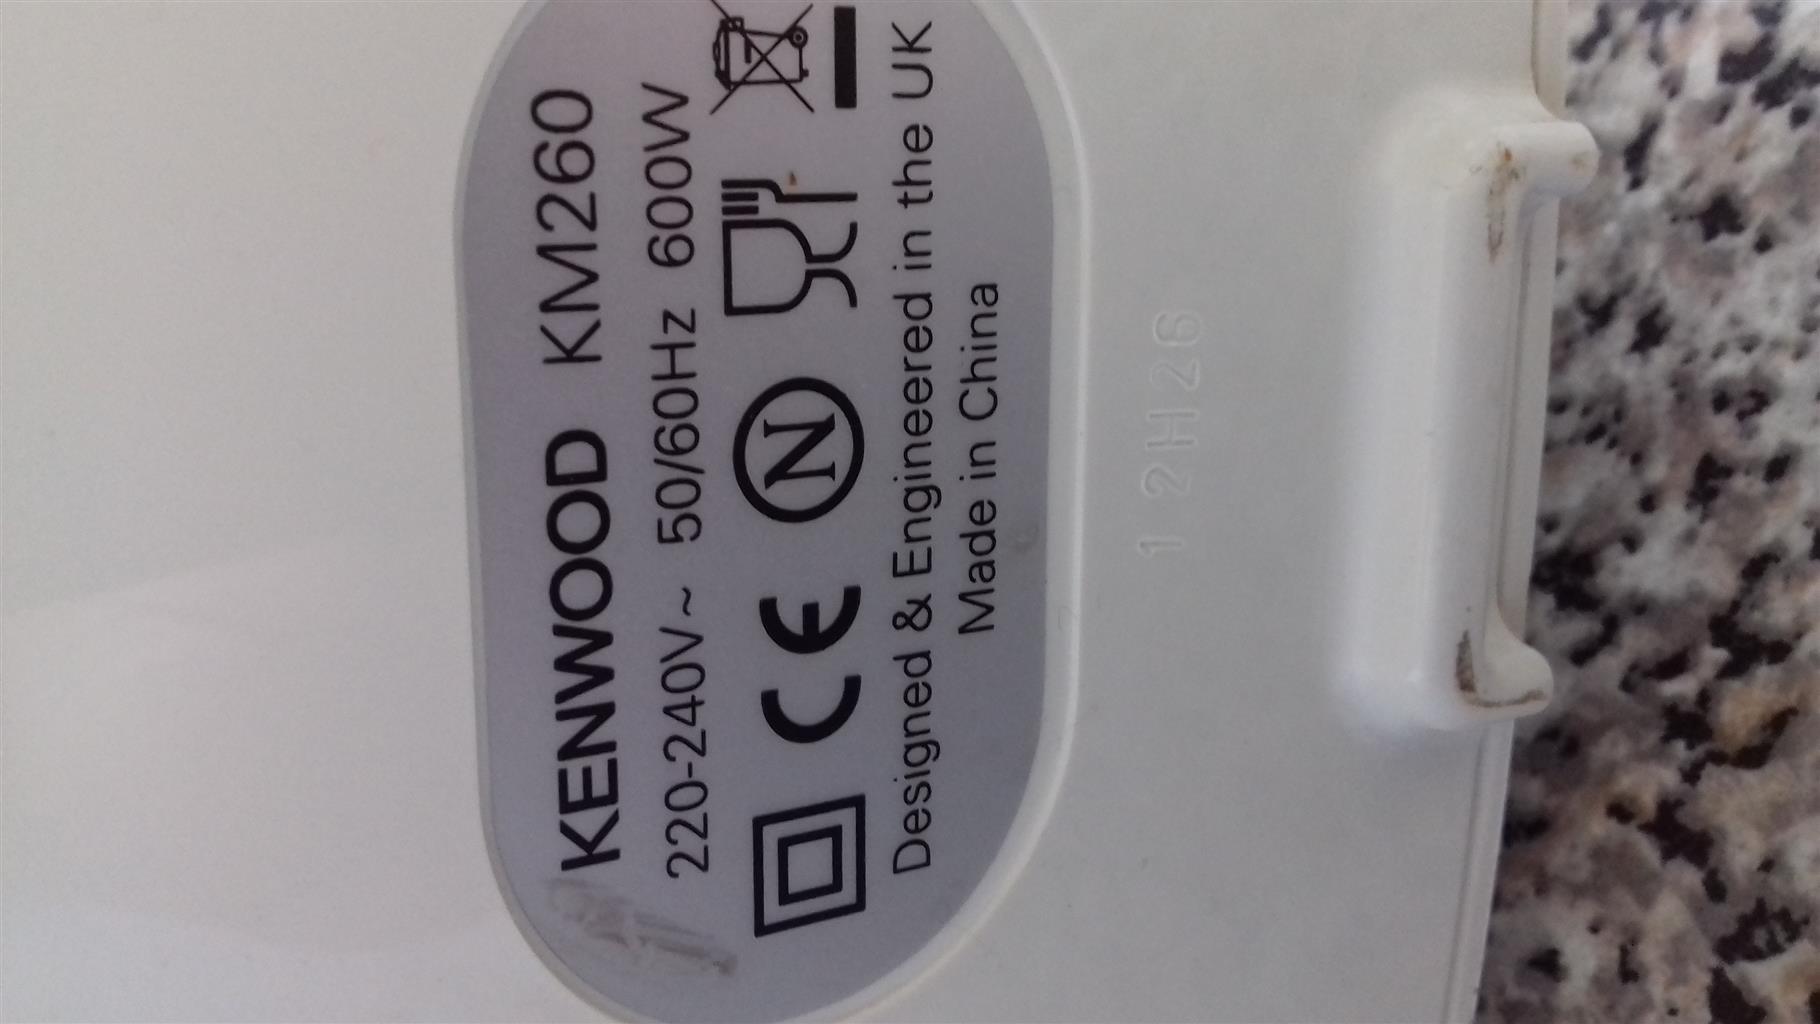 Kenwood Prospero KM260 Food Processor